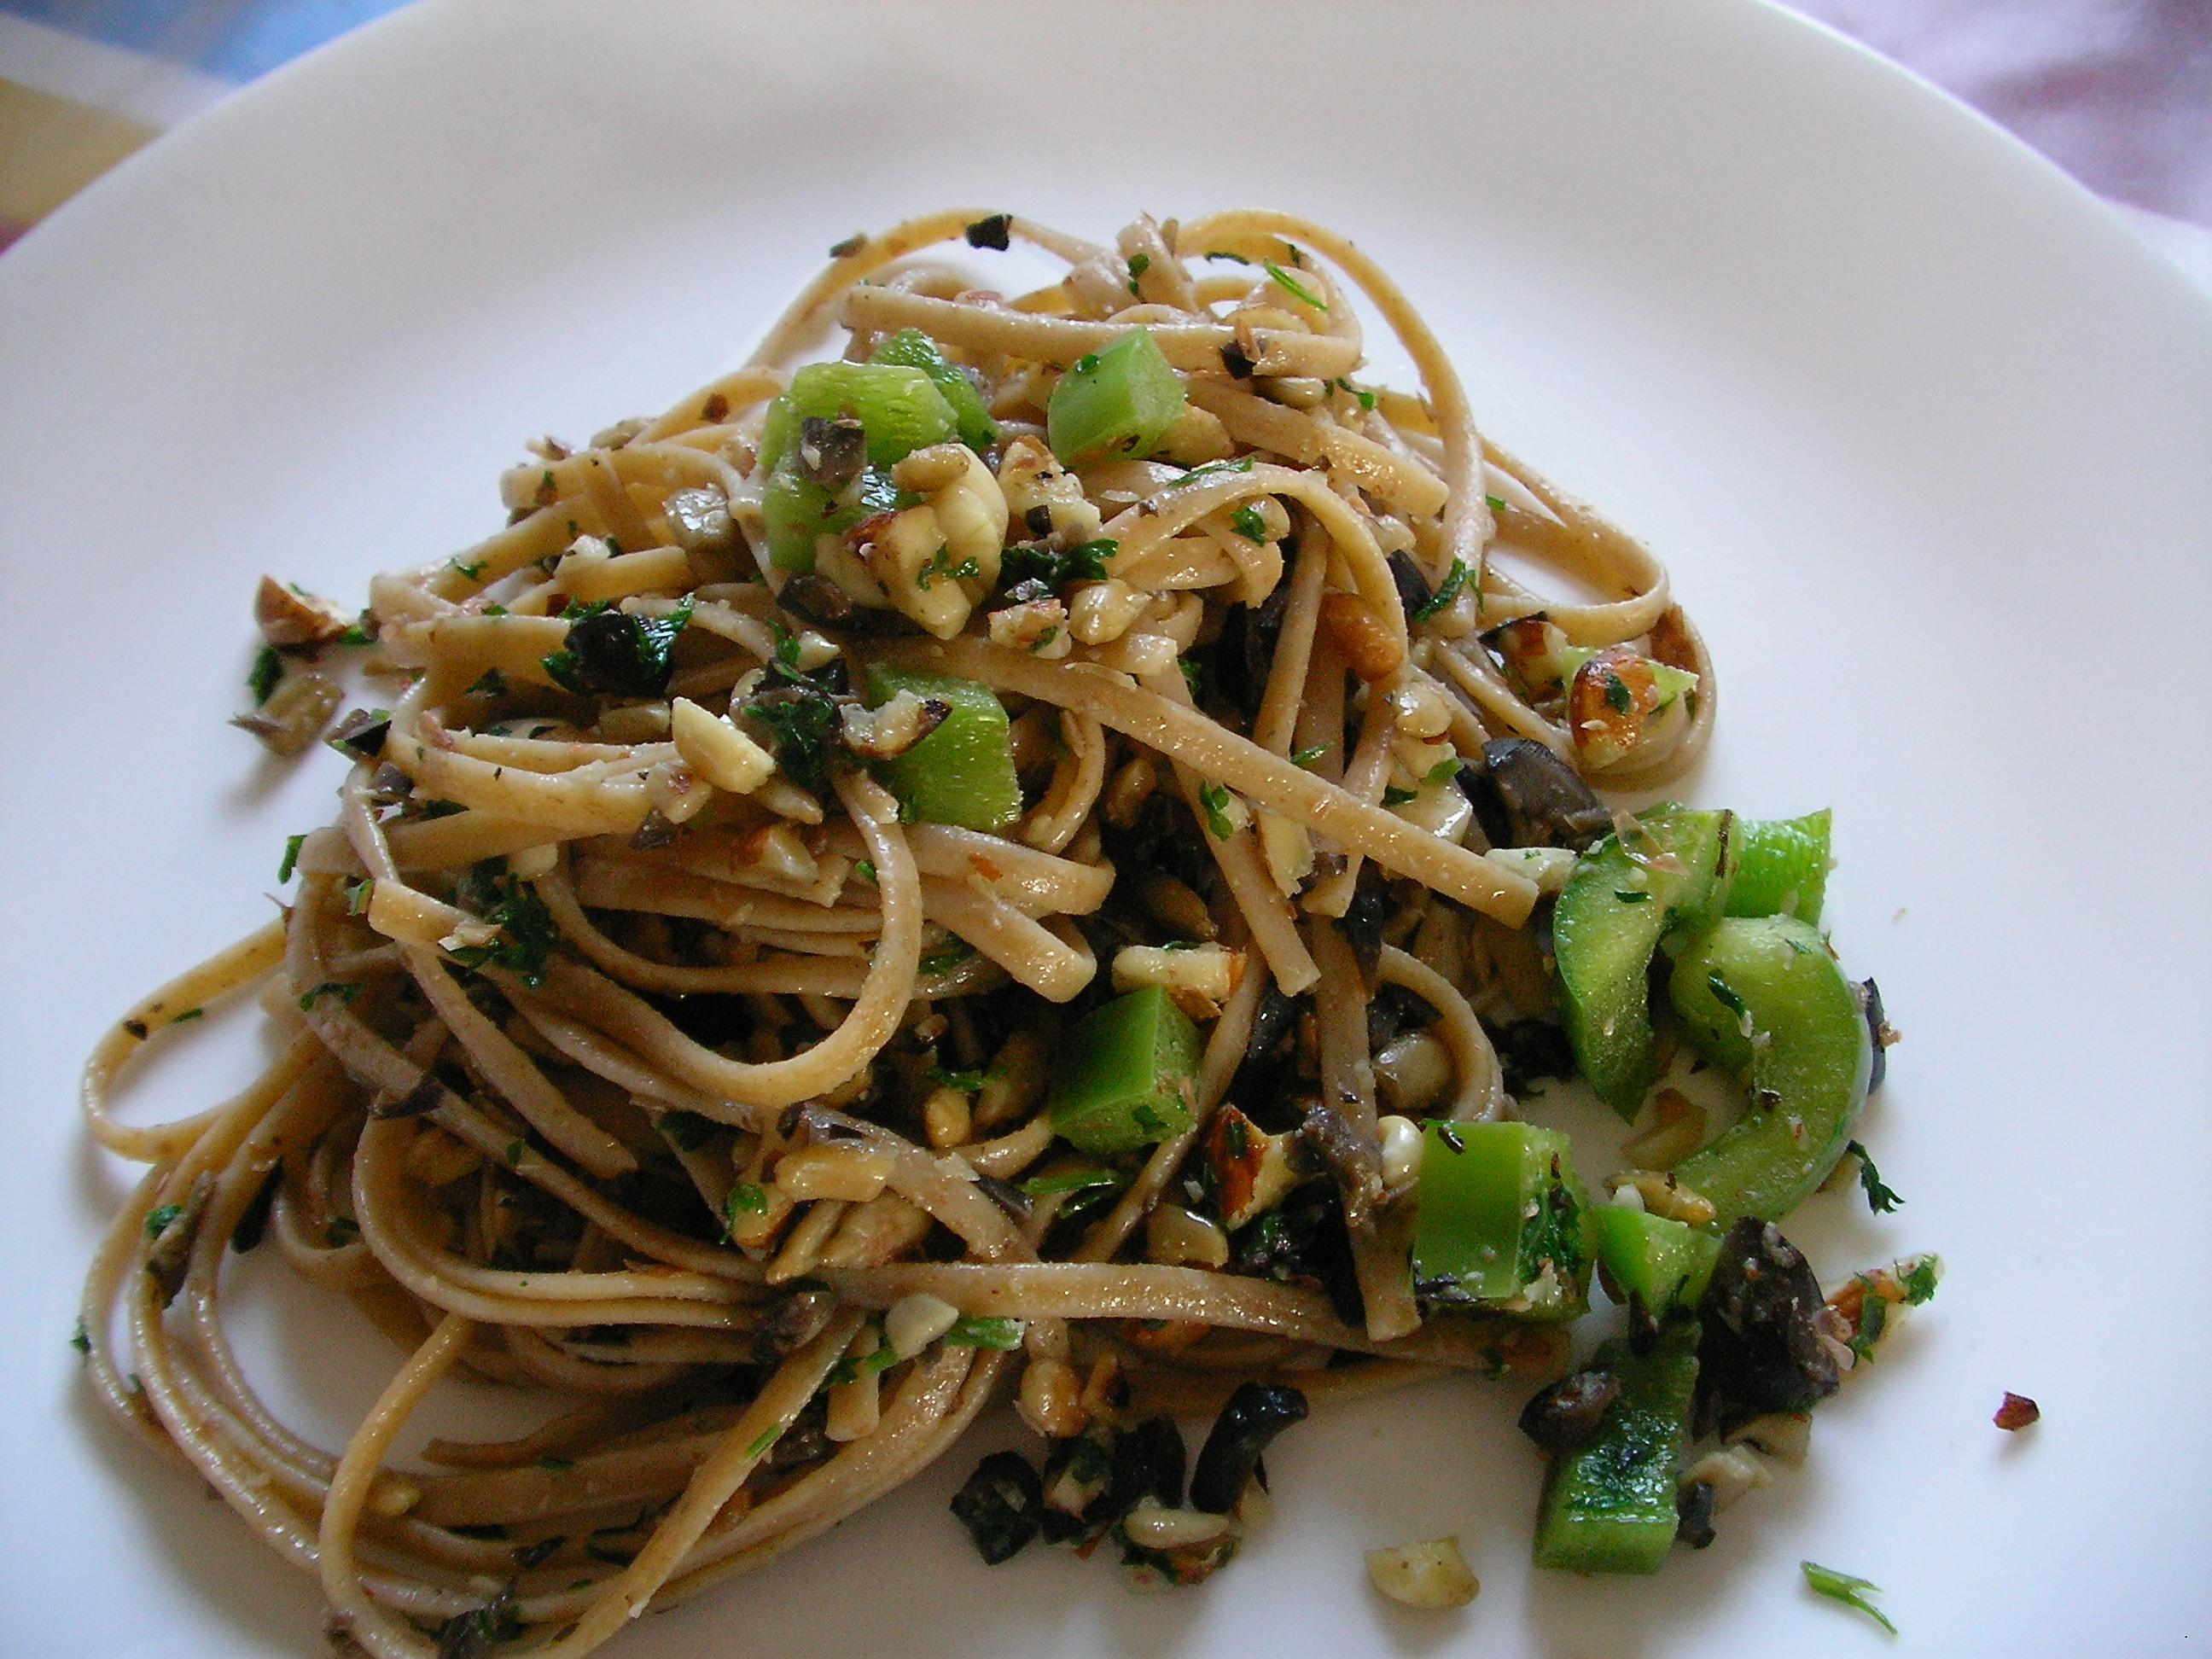 Spaghetti fantasy fasting pasta orthodox fasting recipes for American wholefoods cuisine